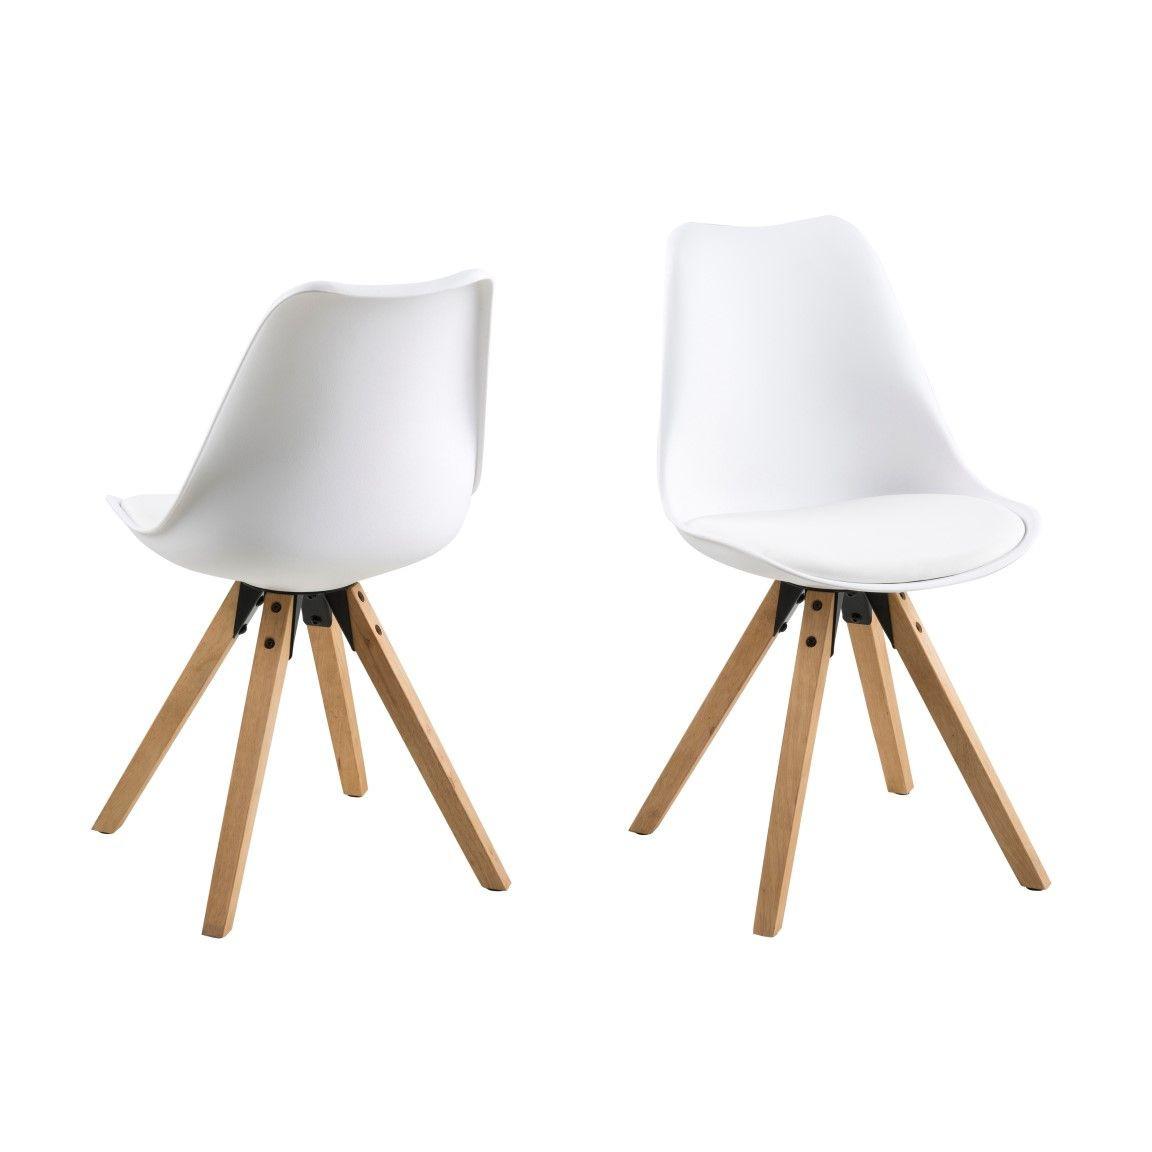 Set of 2 Chairs Nida | White + White Cushion